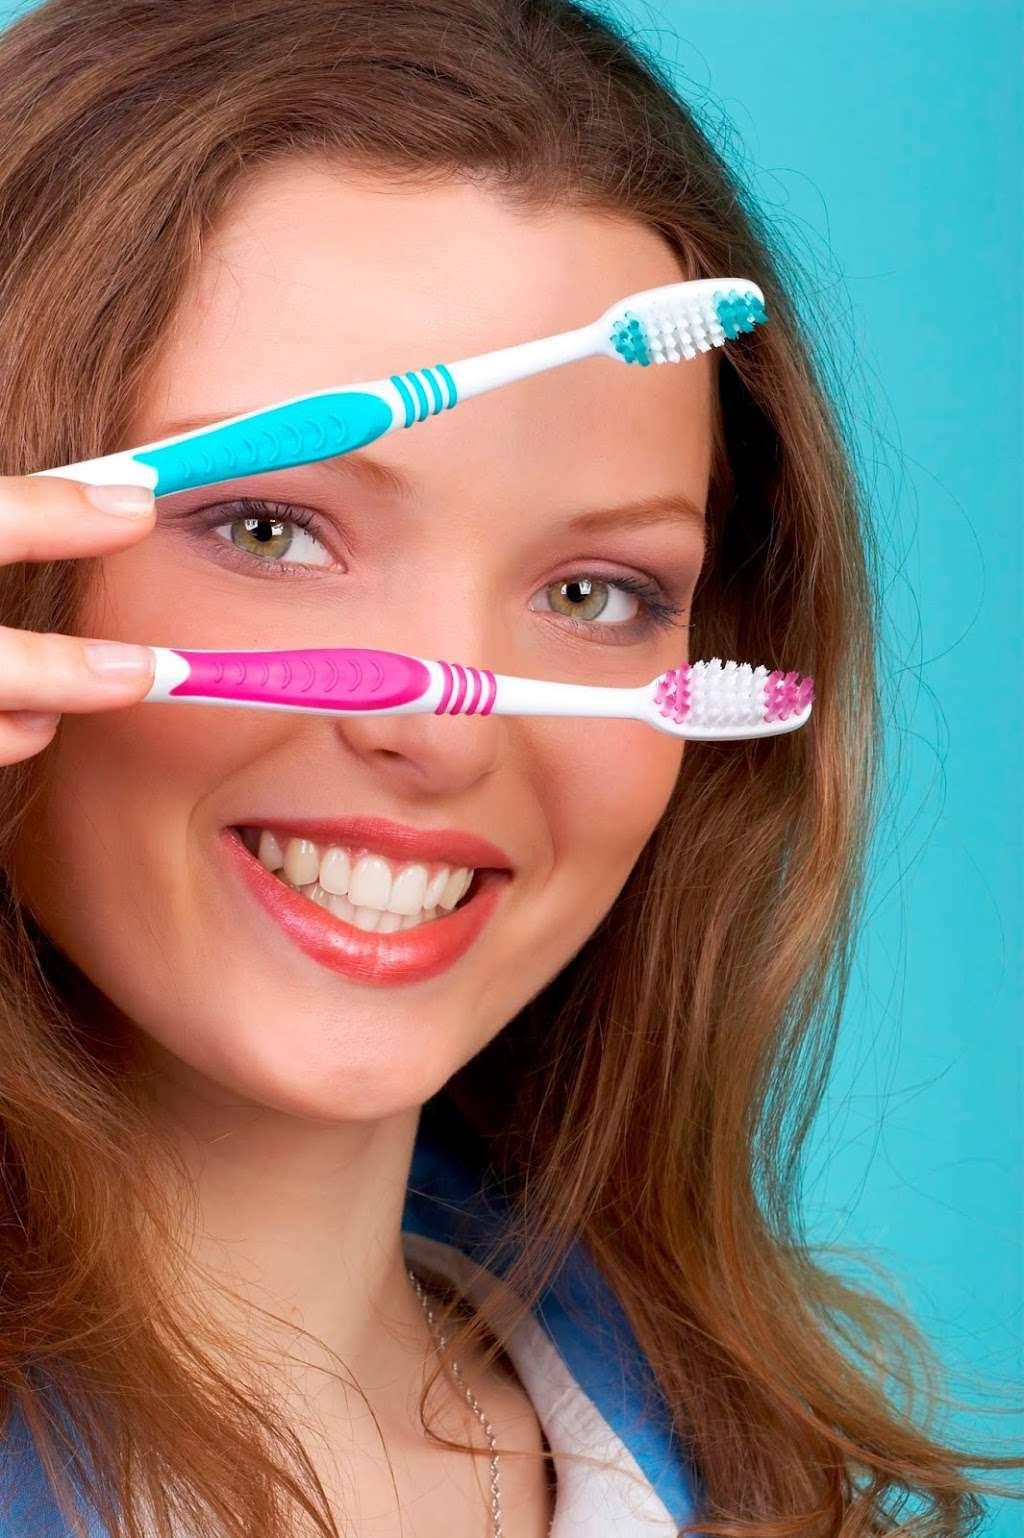 American Dental Solutions - dentist  | Photo 8 of 10 | Address: 4730 Penn Ave, South Heidelberg Township, PA 19608, USA | Phone: (610) 670-9322